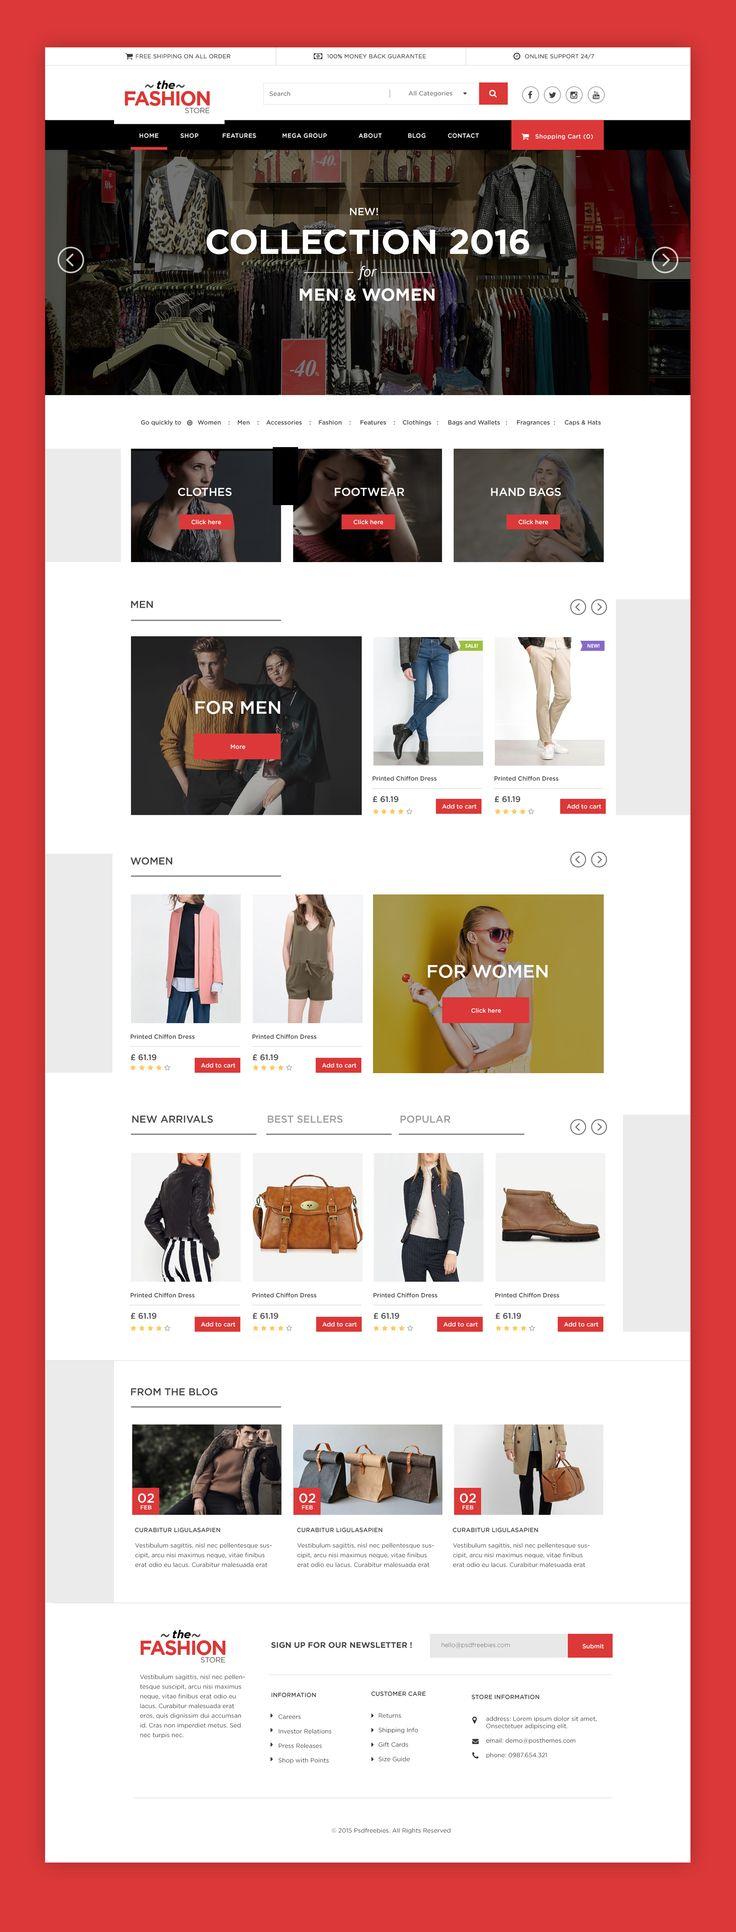 Top 5 Fashion E-commerce Websites That Change The. - Forbes Top e commerce fashion websites